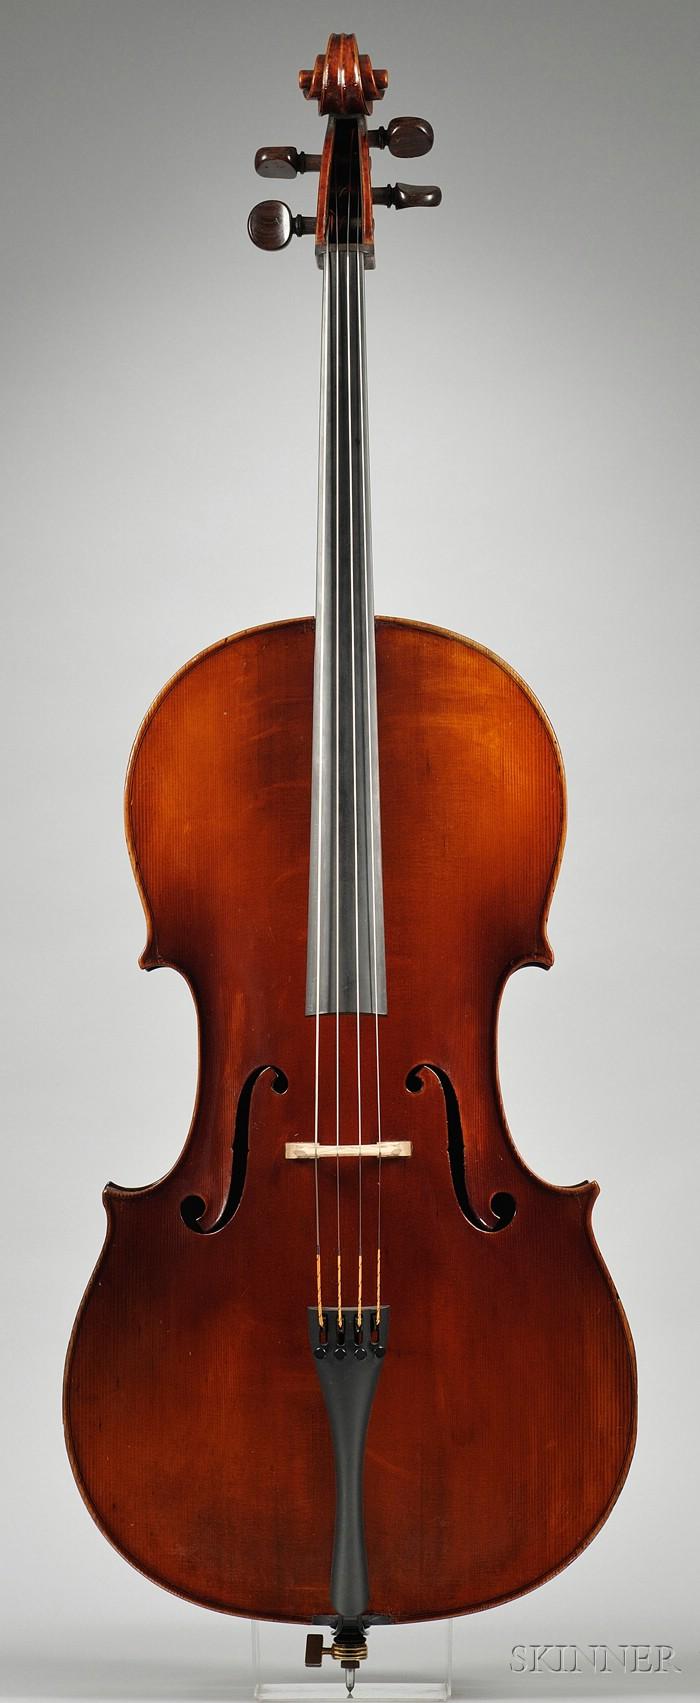 French Violoncello, Emile Laurent, Brussels, c. 1900